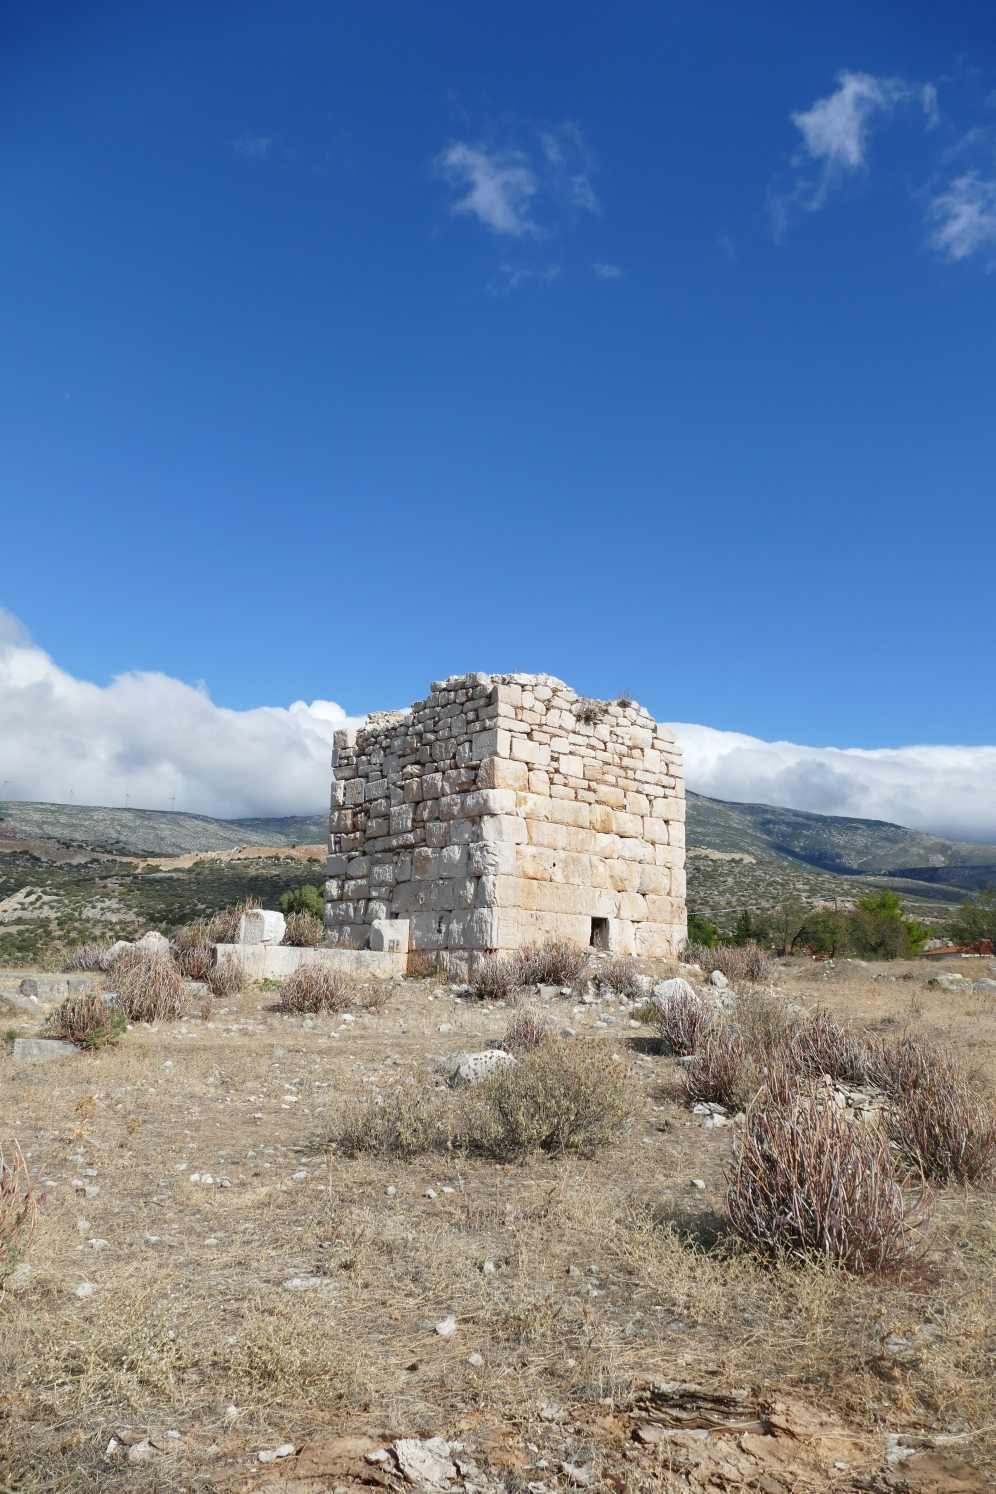 A tower at Thisbai